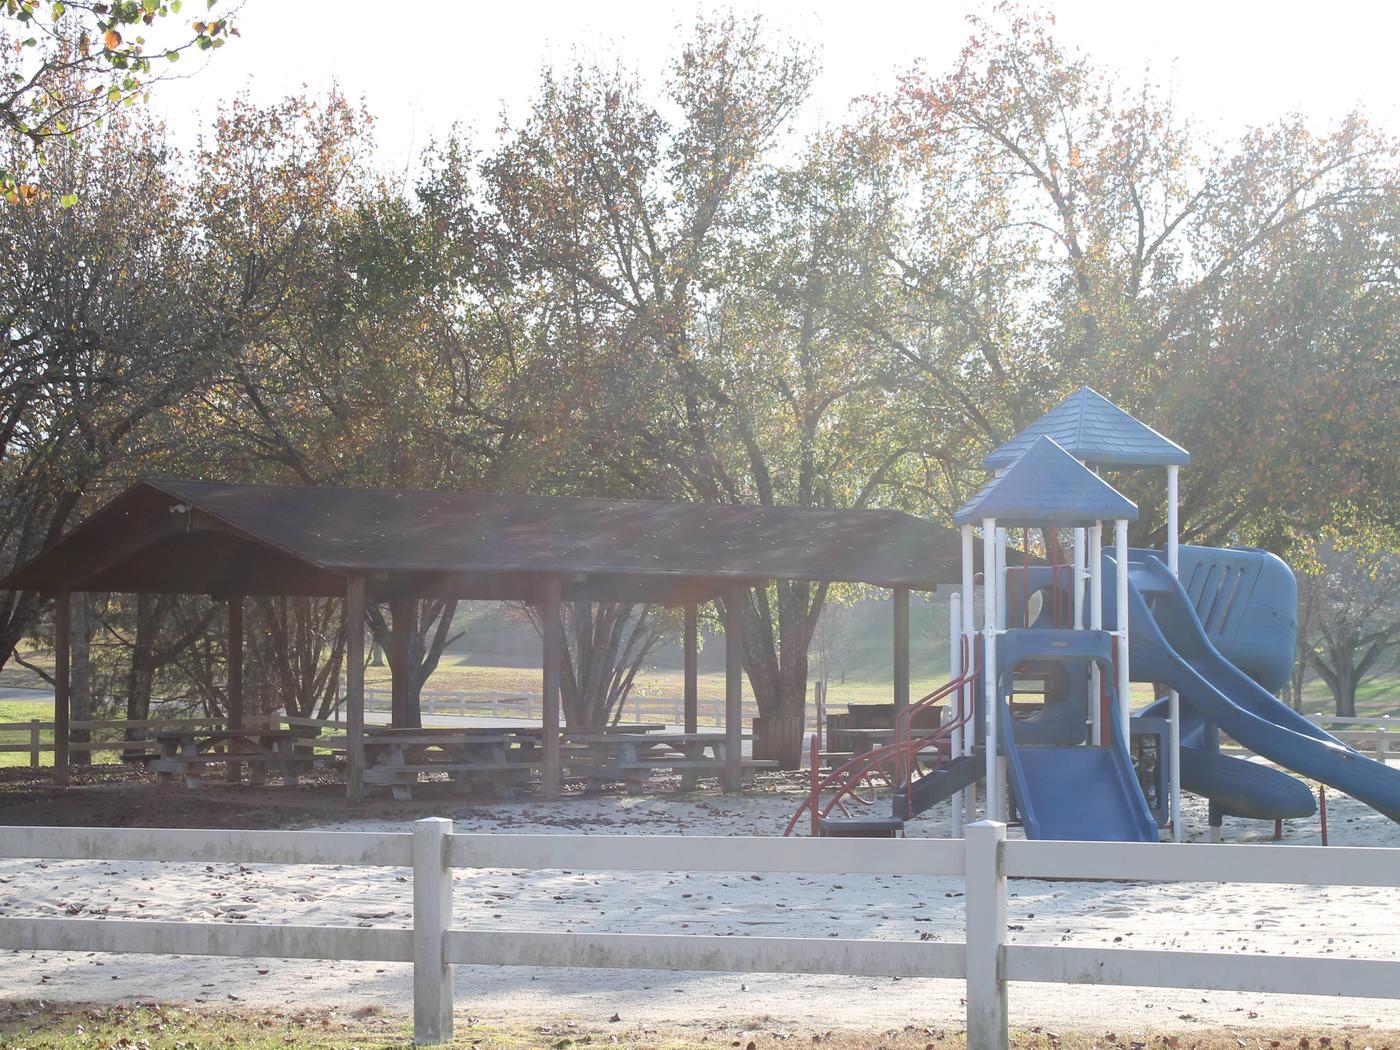 Shelter and playground Shelter and playgrounds at Tailwater Recreation Area